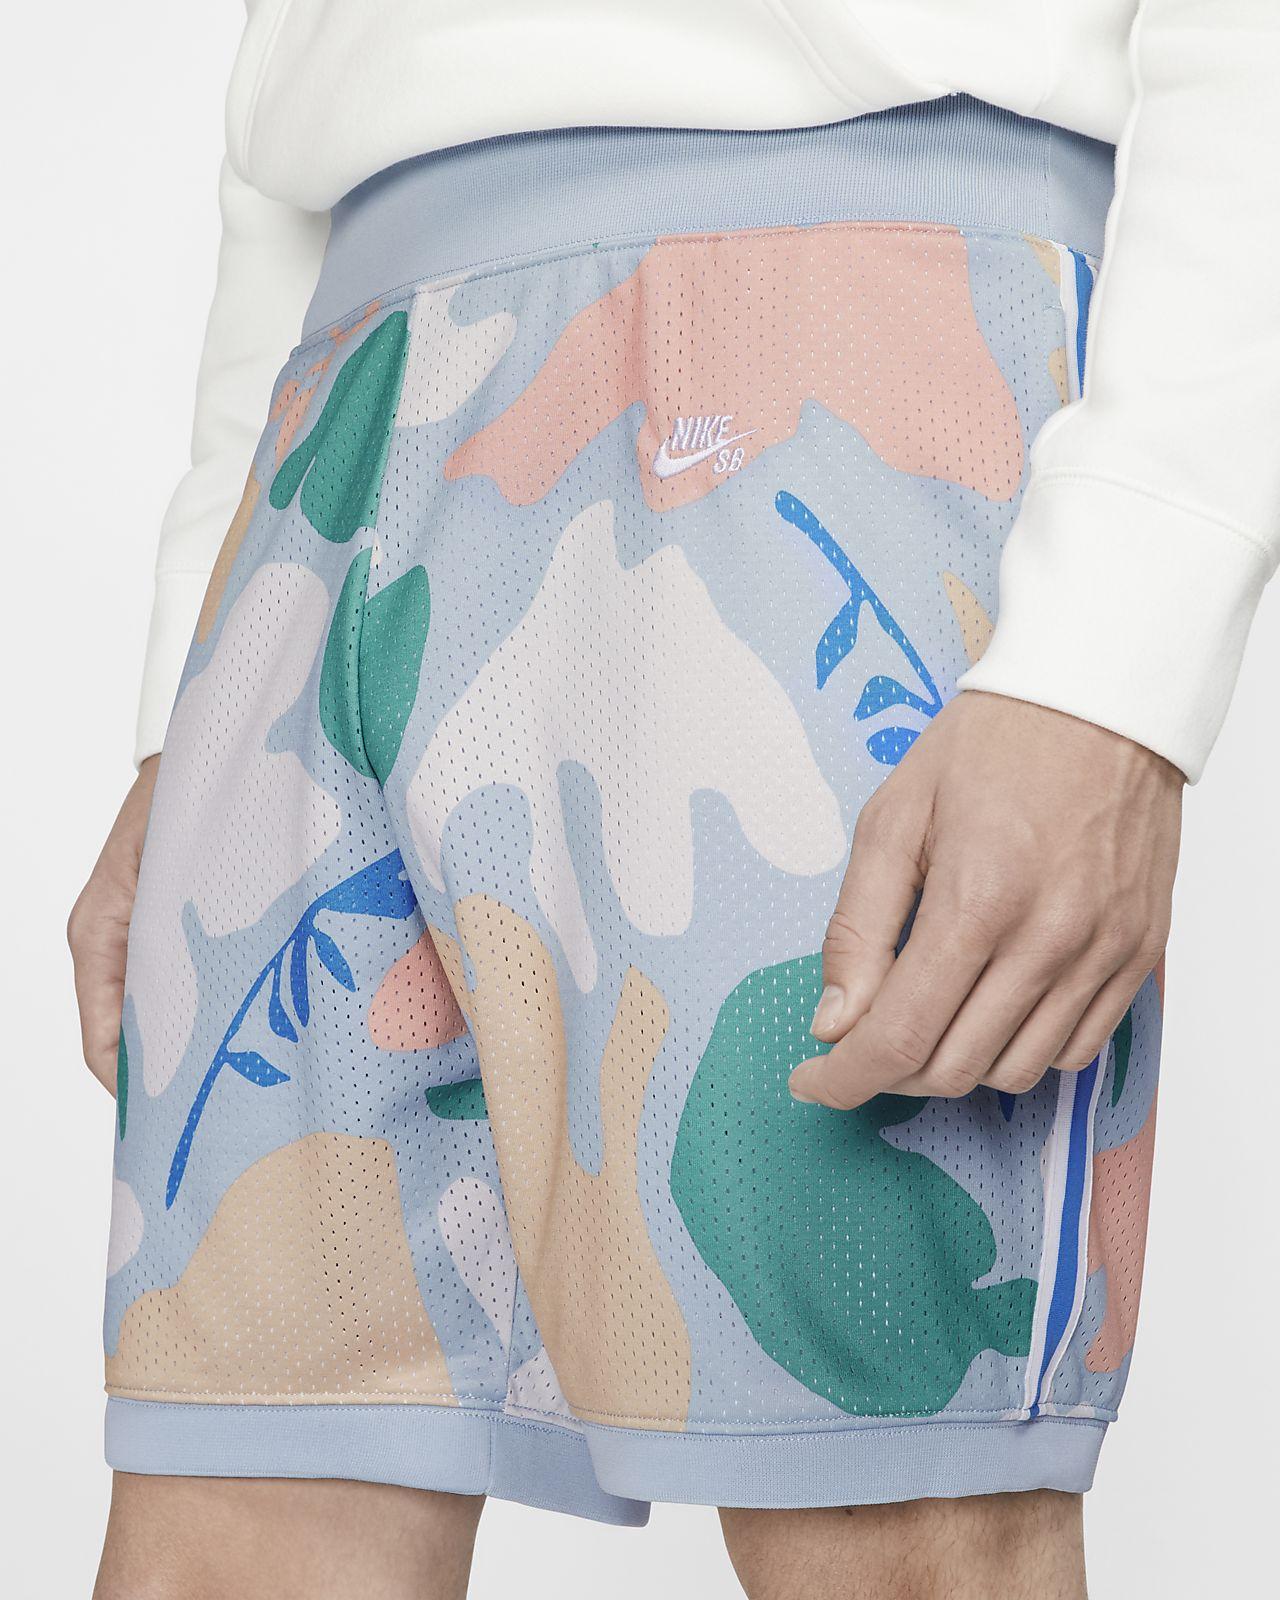 Nike SB Dri-FIT Herren-Skateboardshorts mit Print